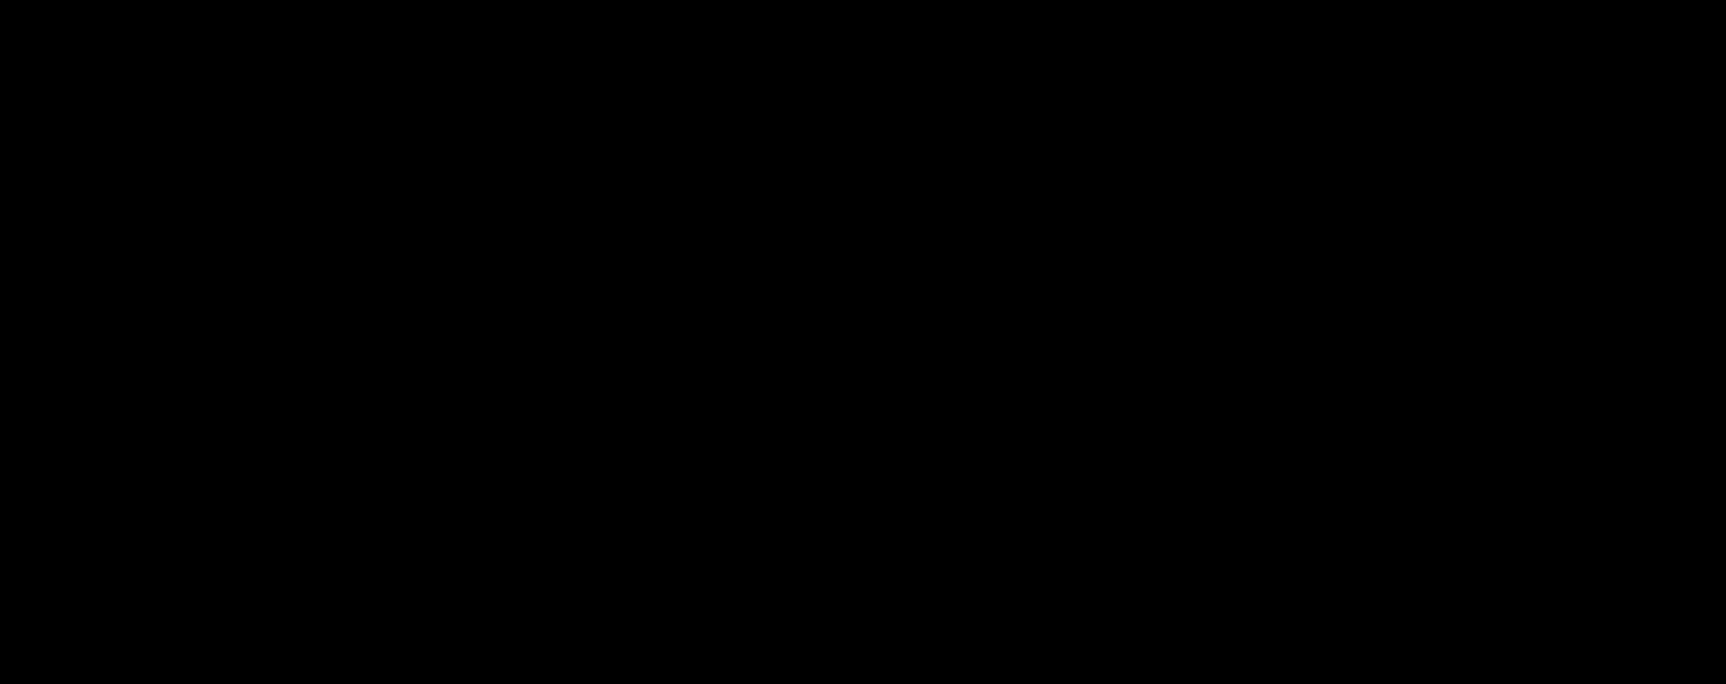 4-[2-(3-Fluorophenoxy)ethyl]morpholine-4-boronic acid pinacol ester